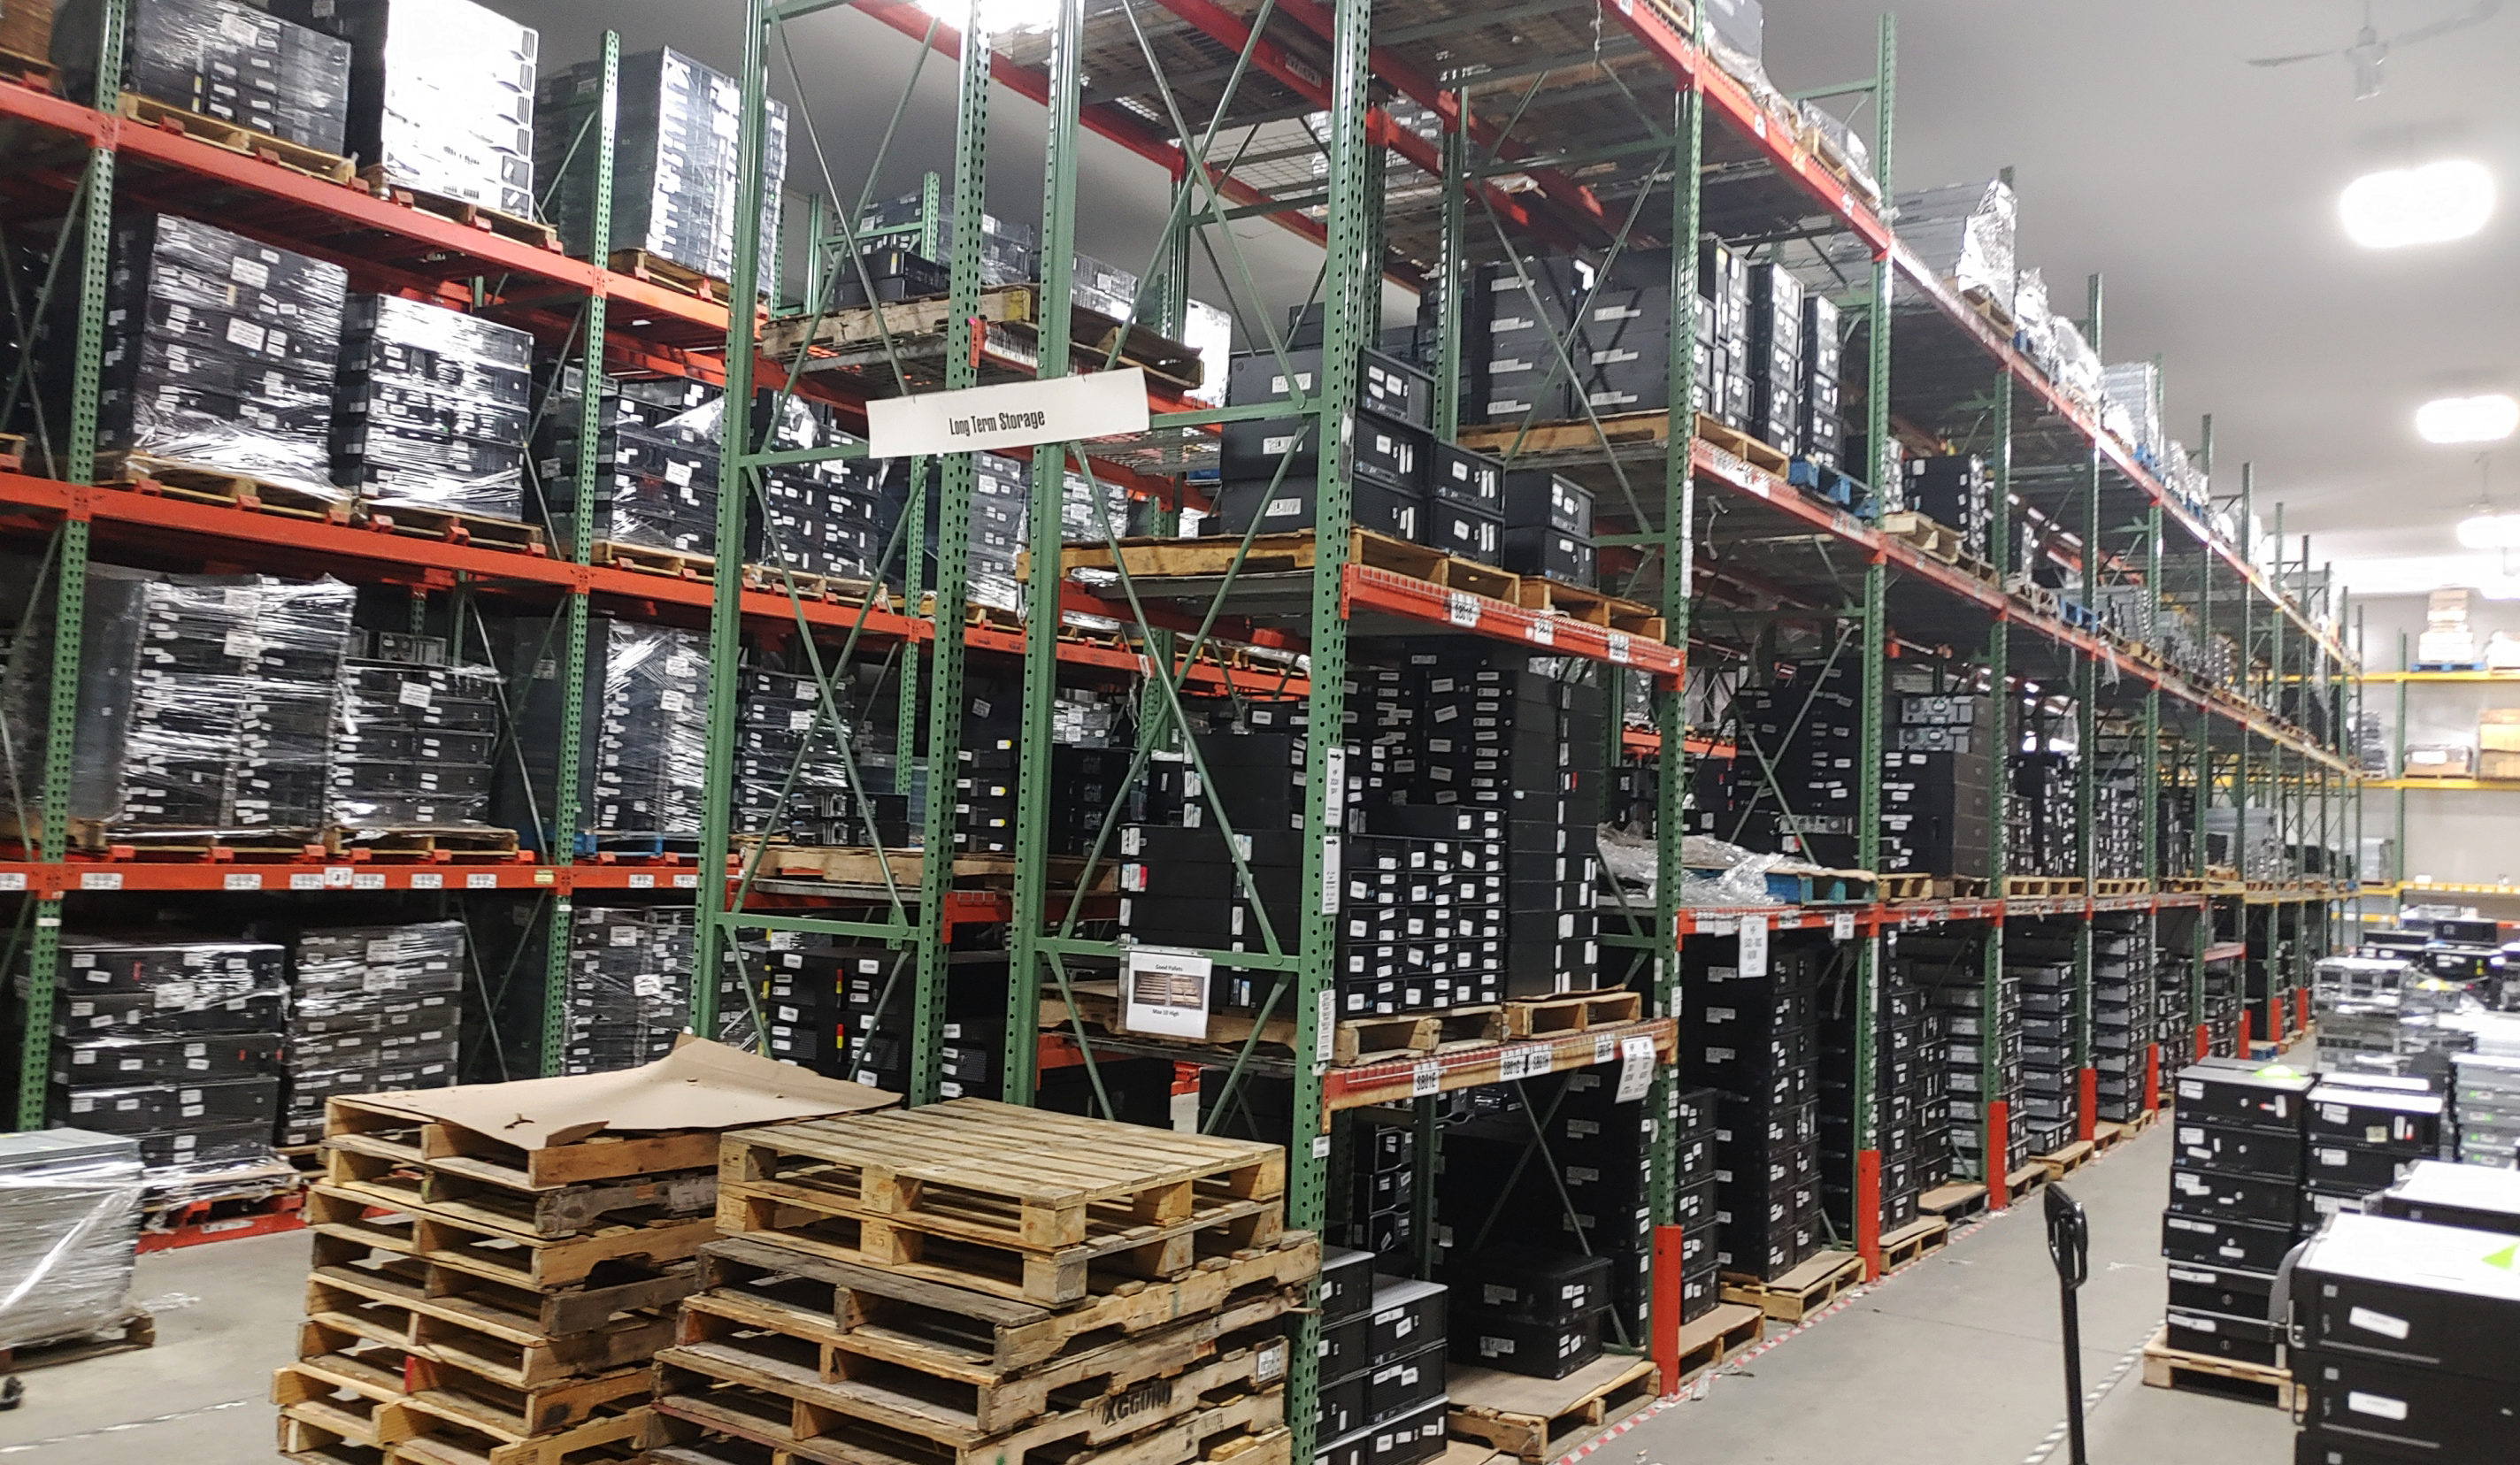 warehouse-image-2.png